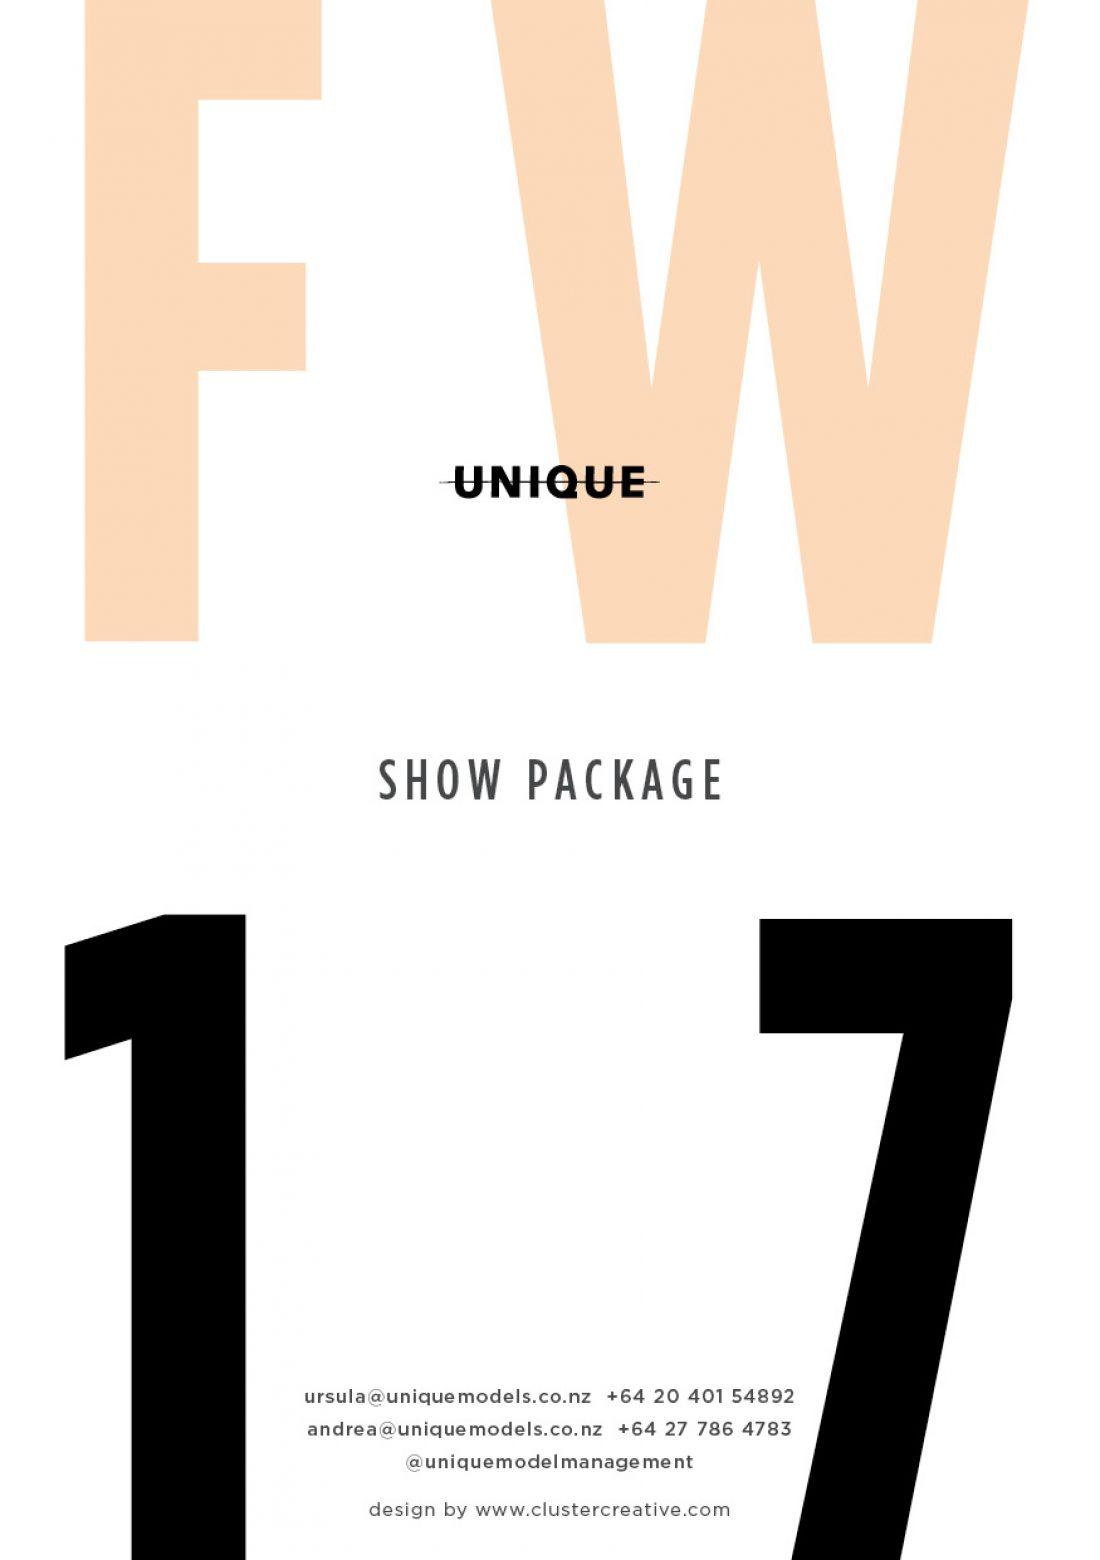 NZFW Showpackage FW '17 designed by Tim Dove @ www.clustercreative.com